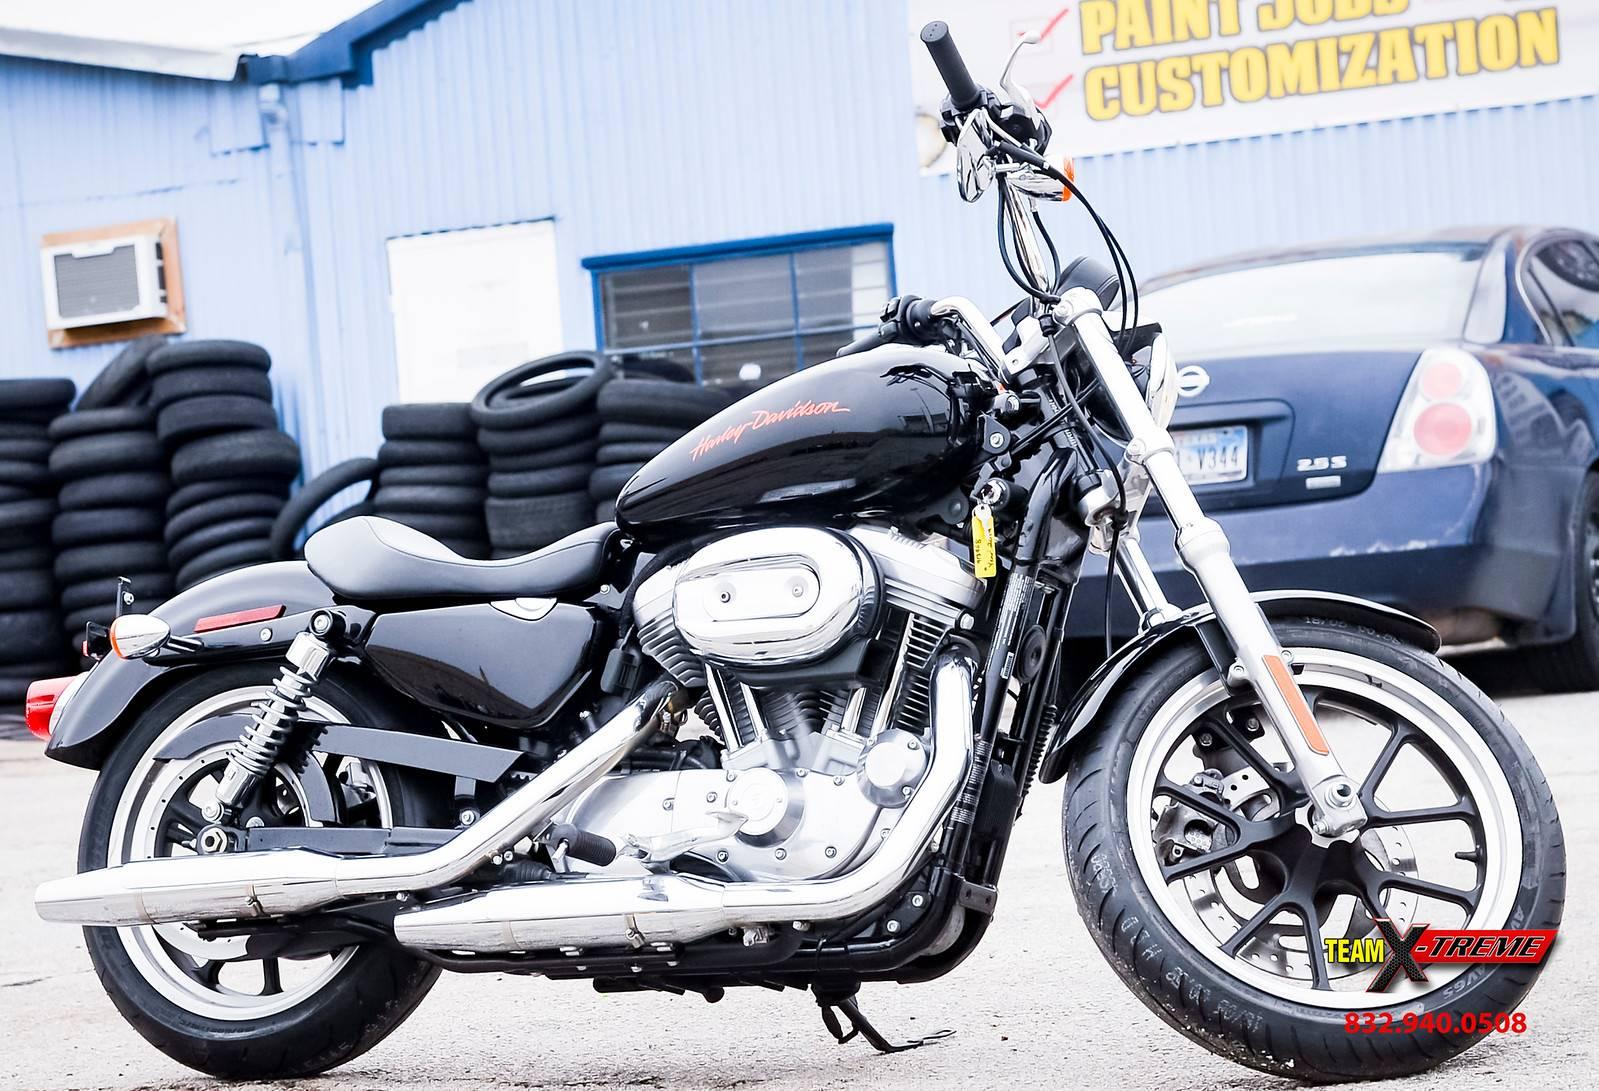 2014 Harley-Davidson Sportster SuperLow 1